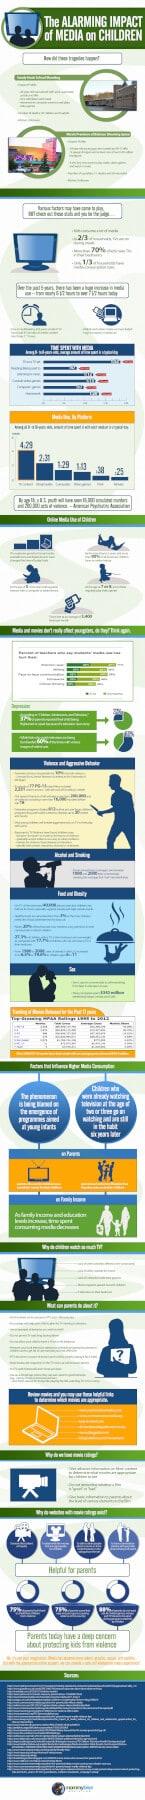 The Alarming Impact of Media on Children Infographic